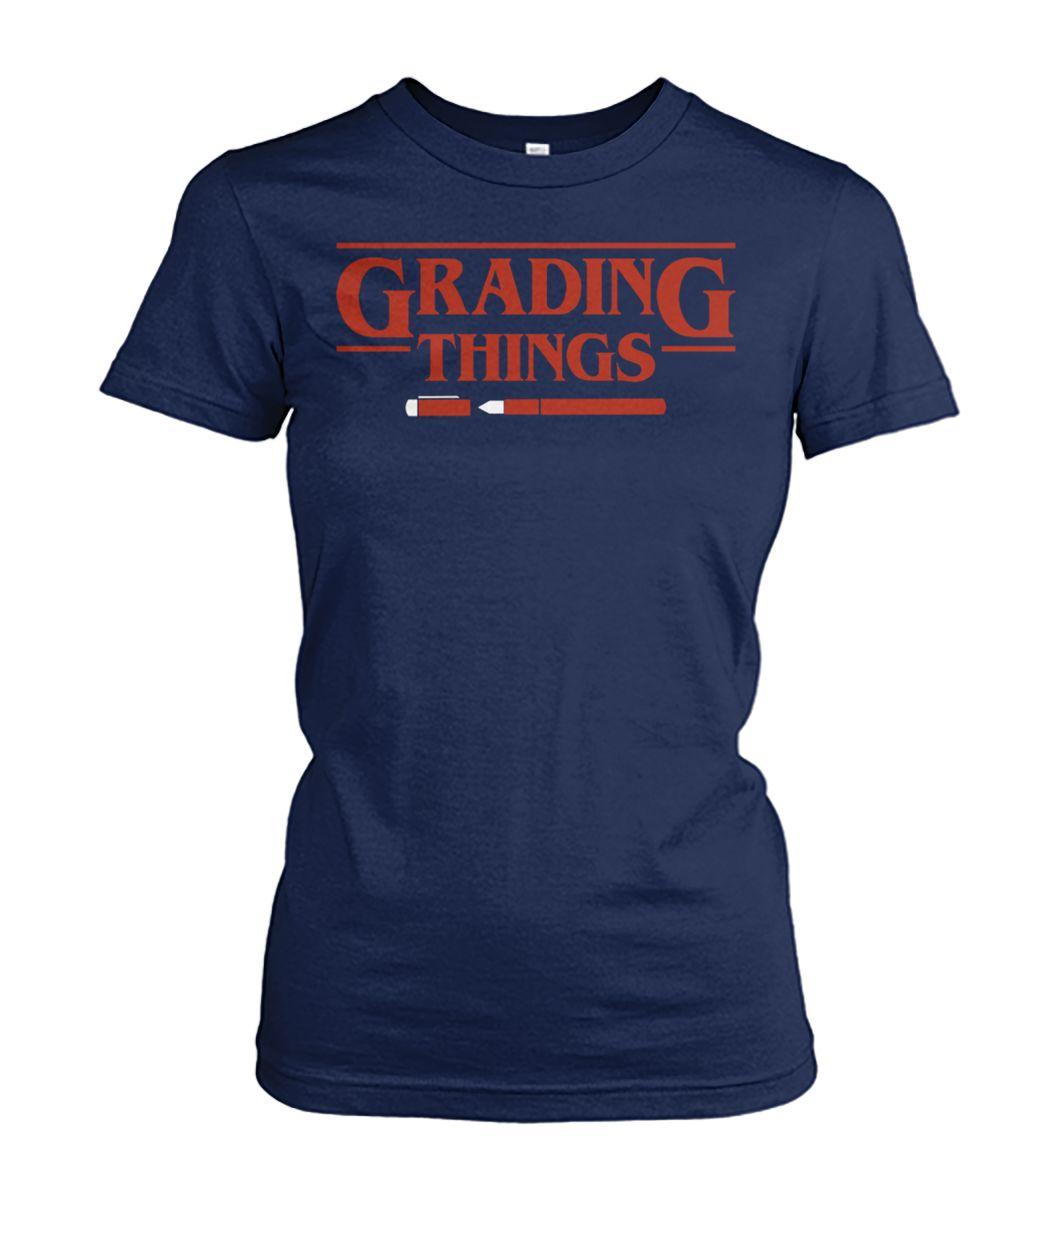 [Hot version] Stranger things grading things shirt